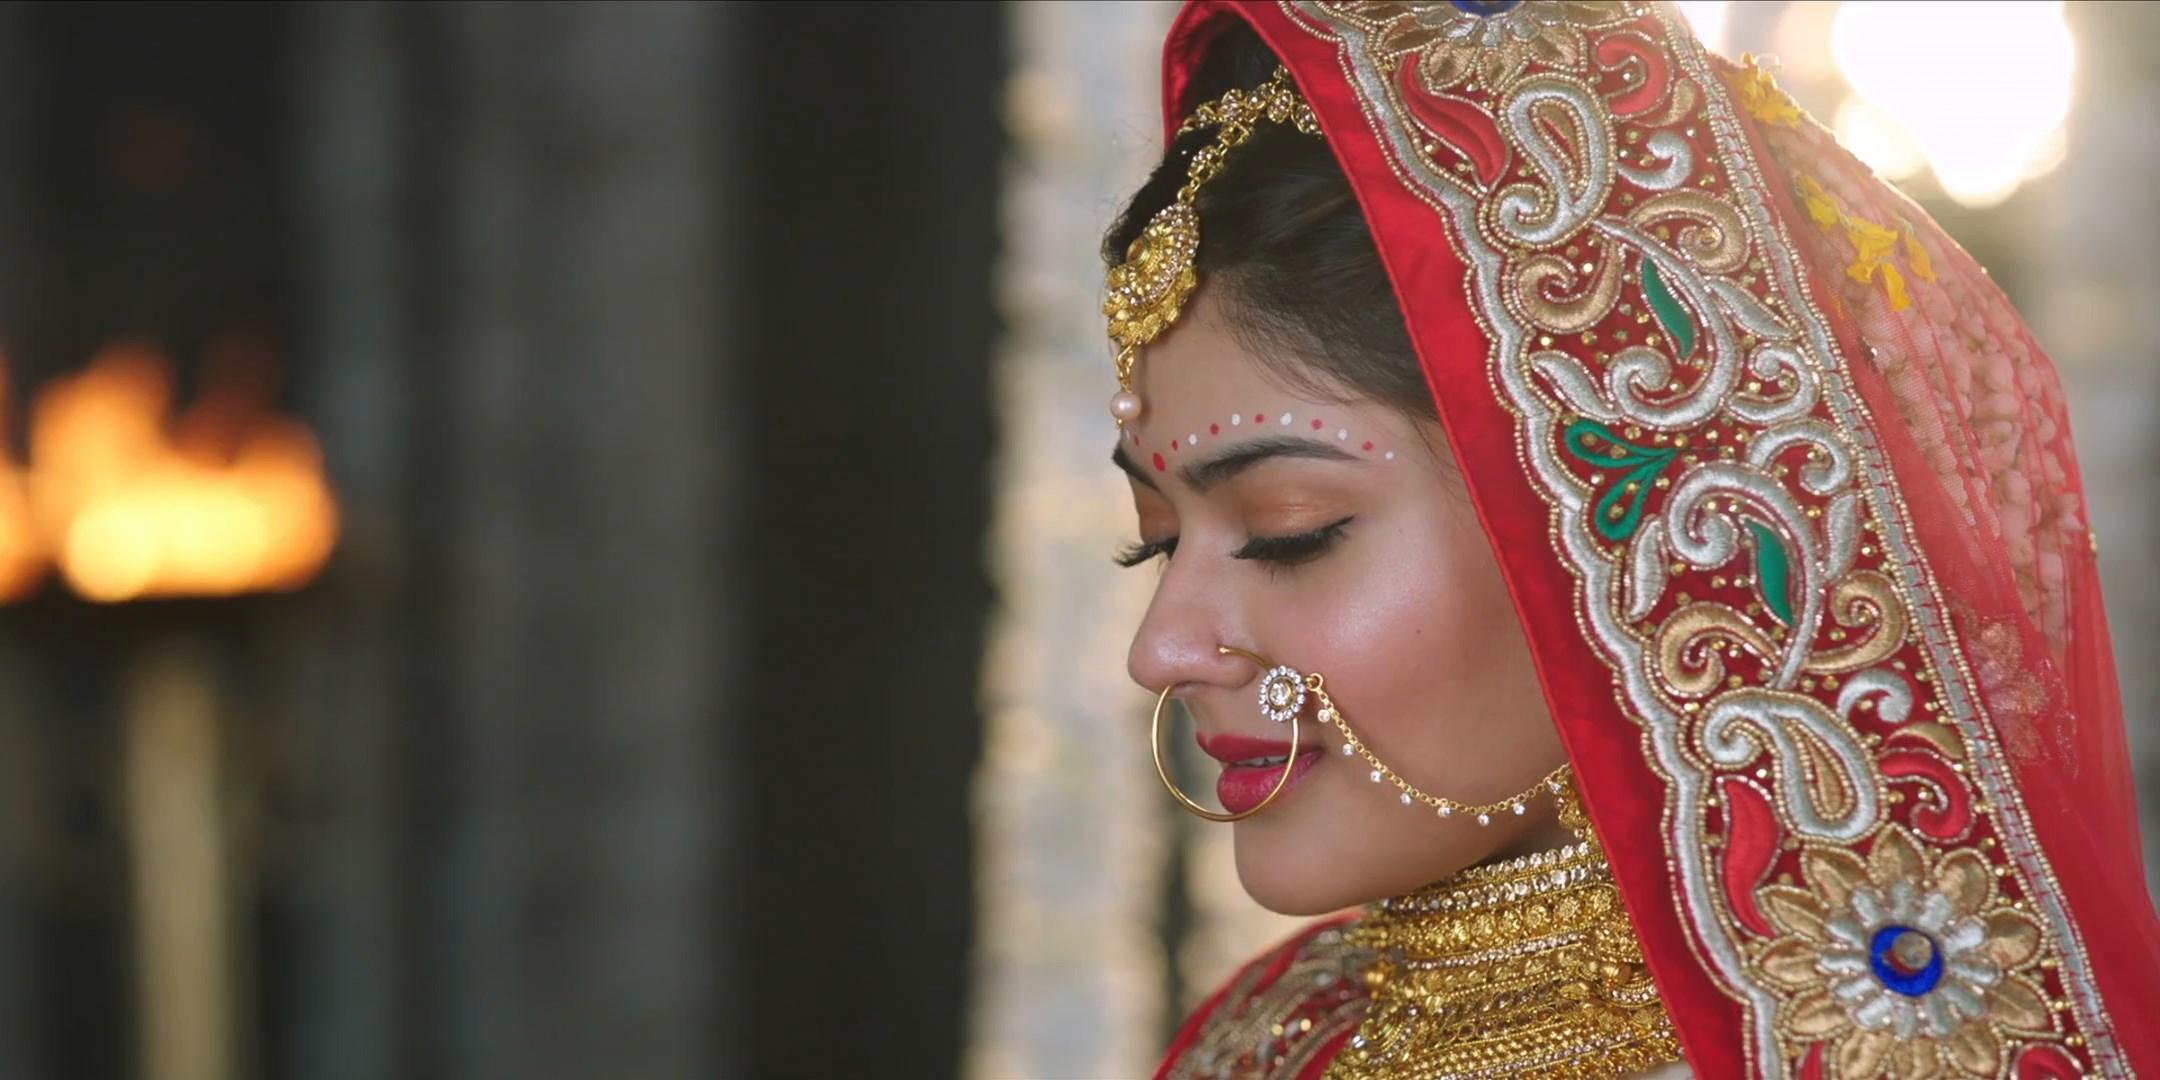 Chhatrasal (19)